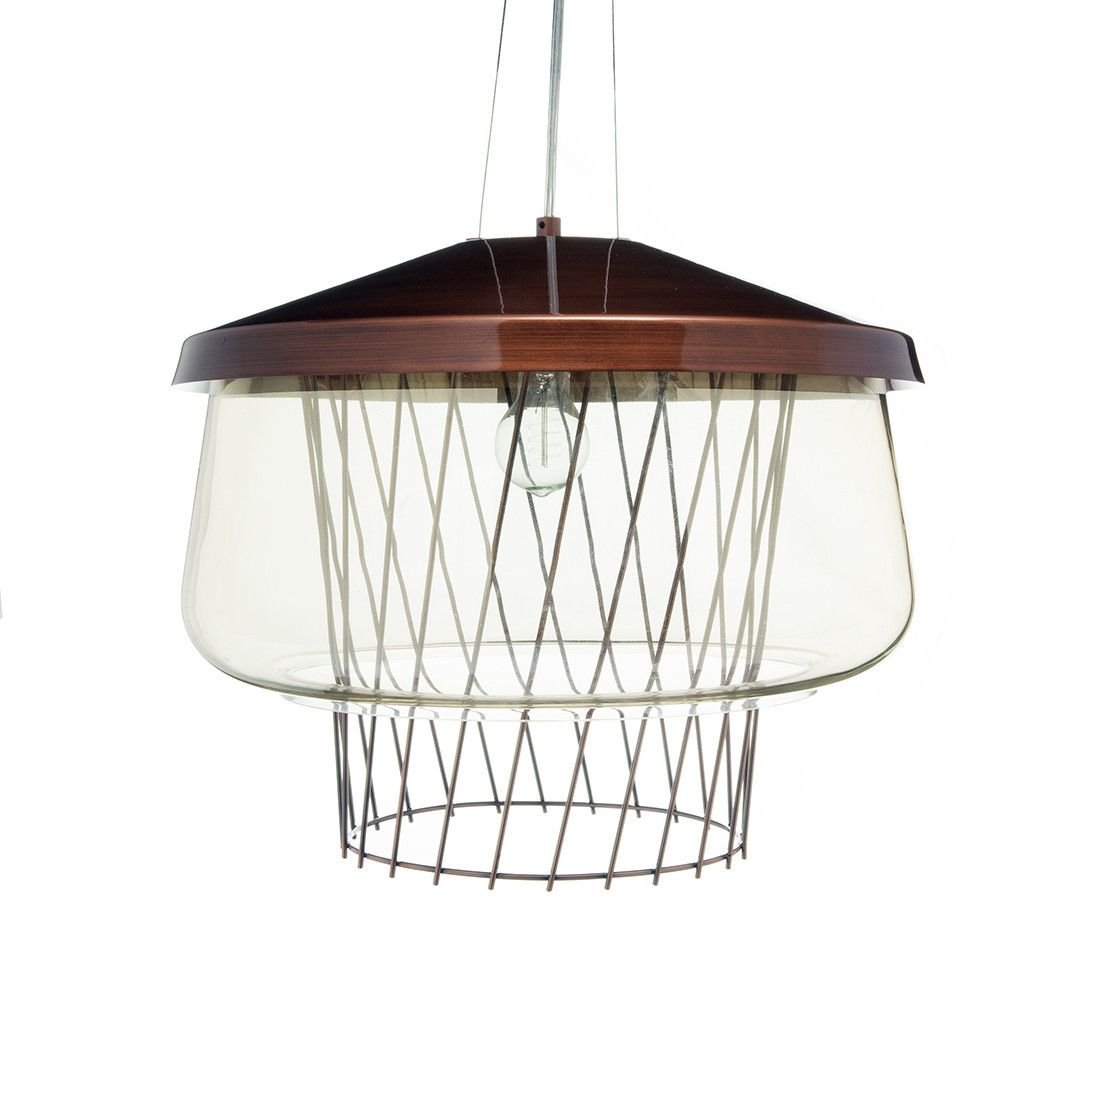 Modern Danish Design Ceiling Lamp Cissy Lighting Ideas